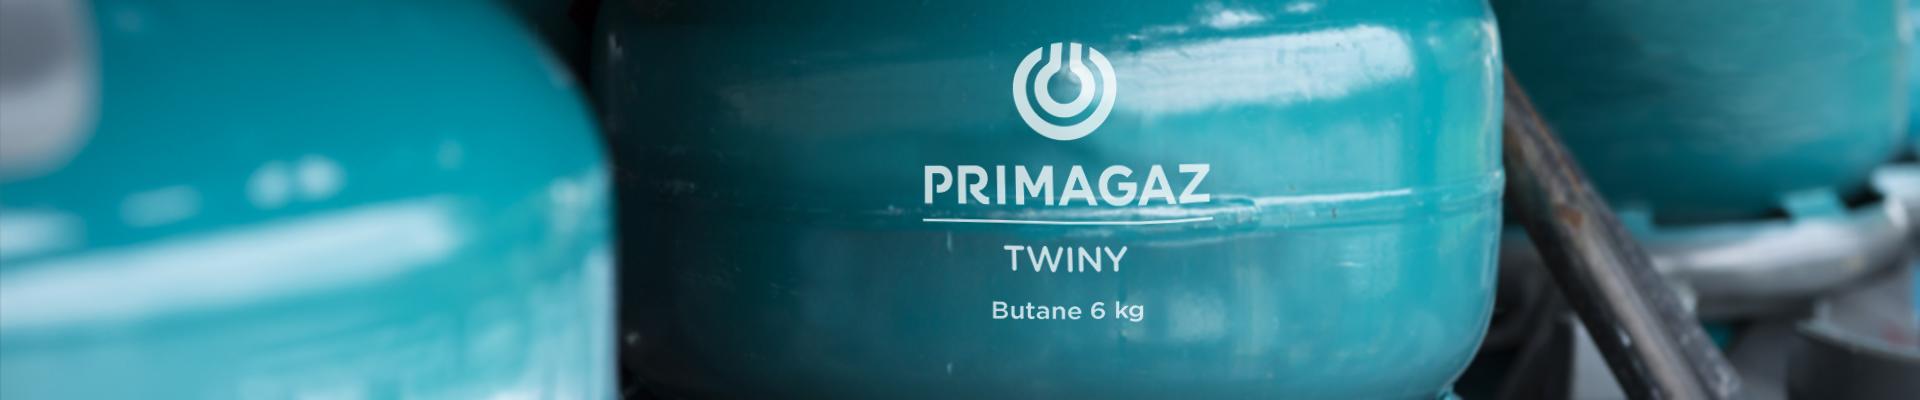 Stockage bouteilles gaz Primagaz